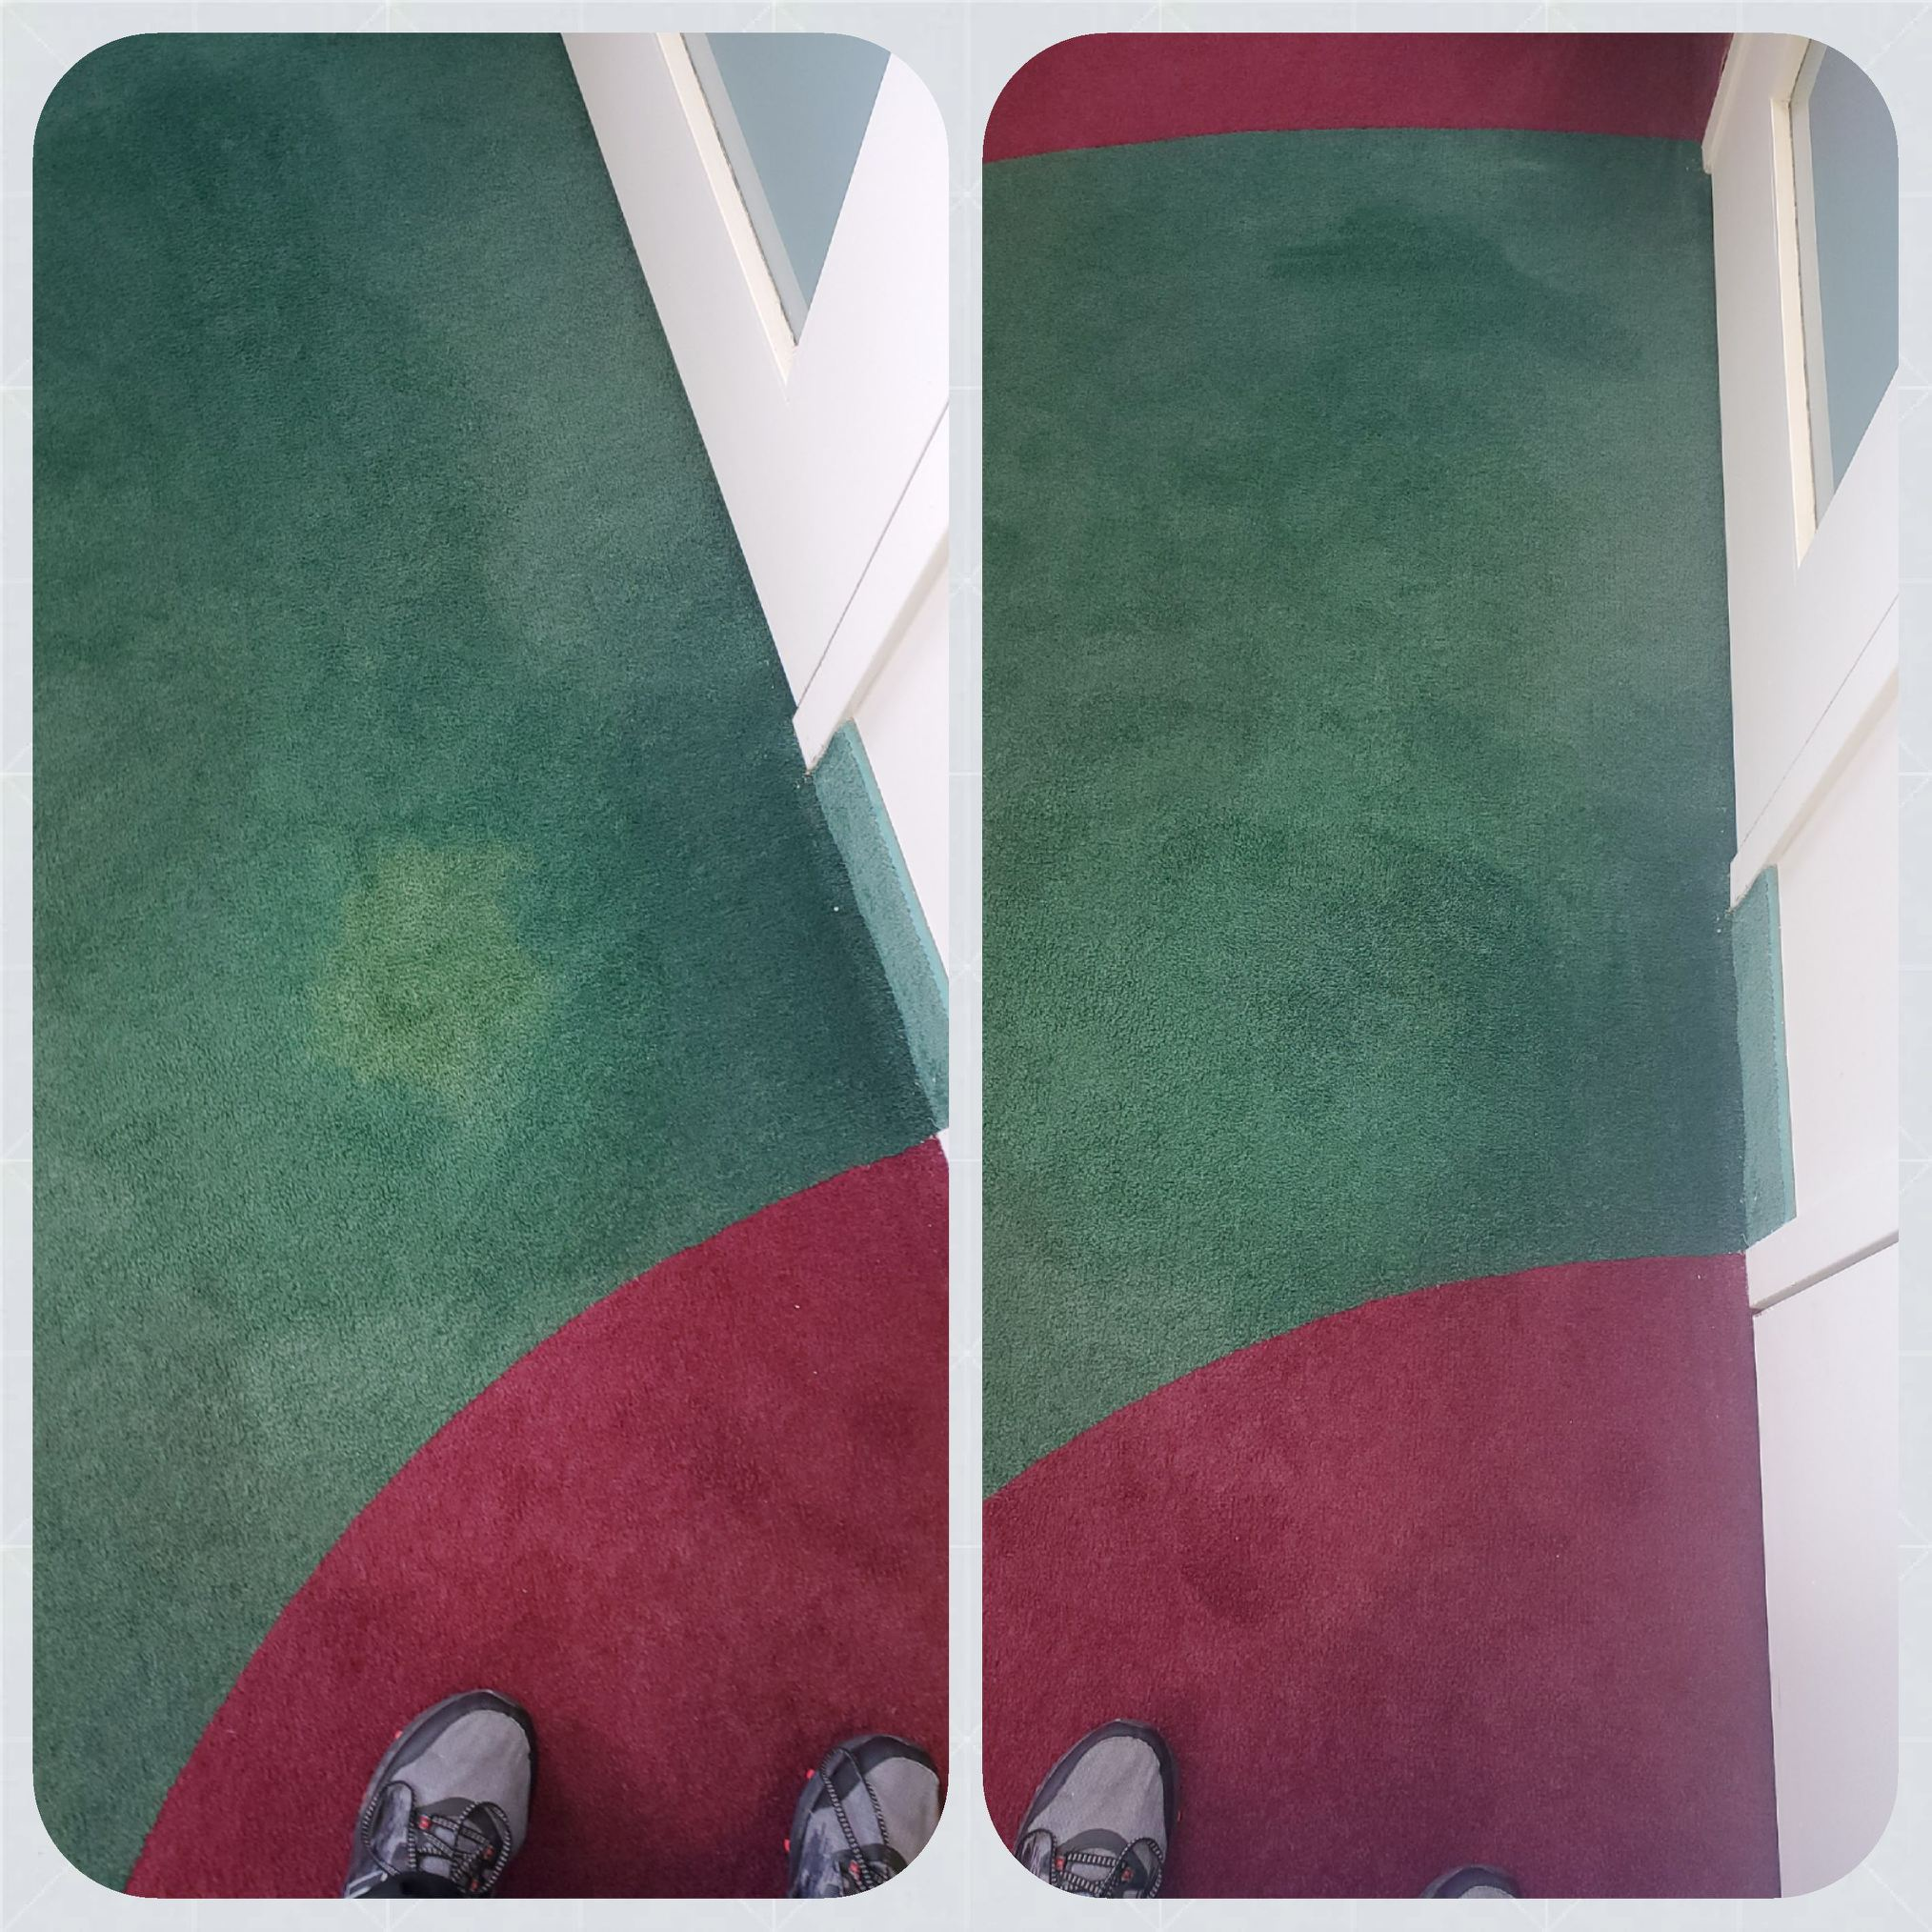 Bleach Spot Repair of Dr\'s Office in Ellicott City, MD